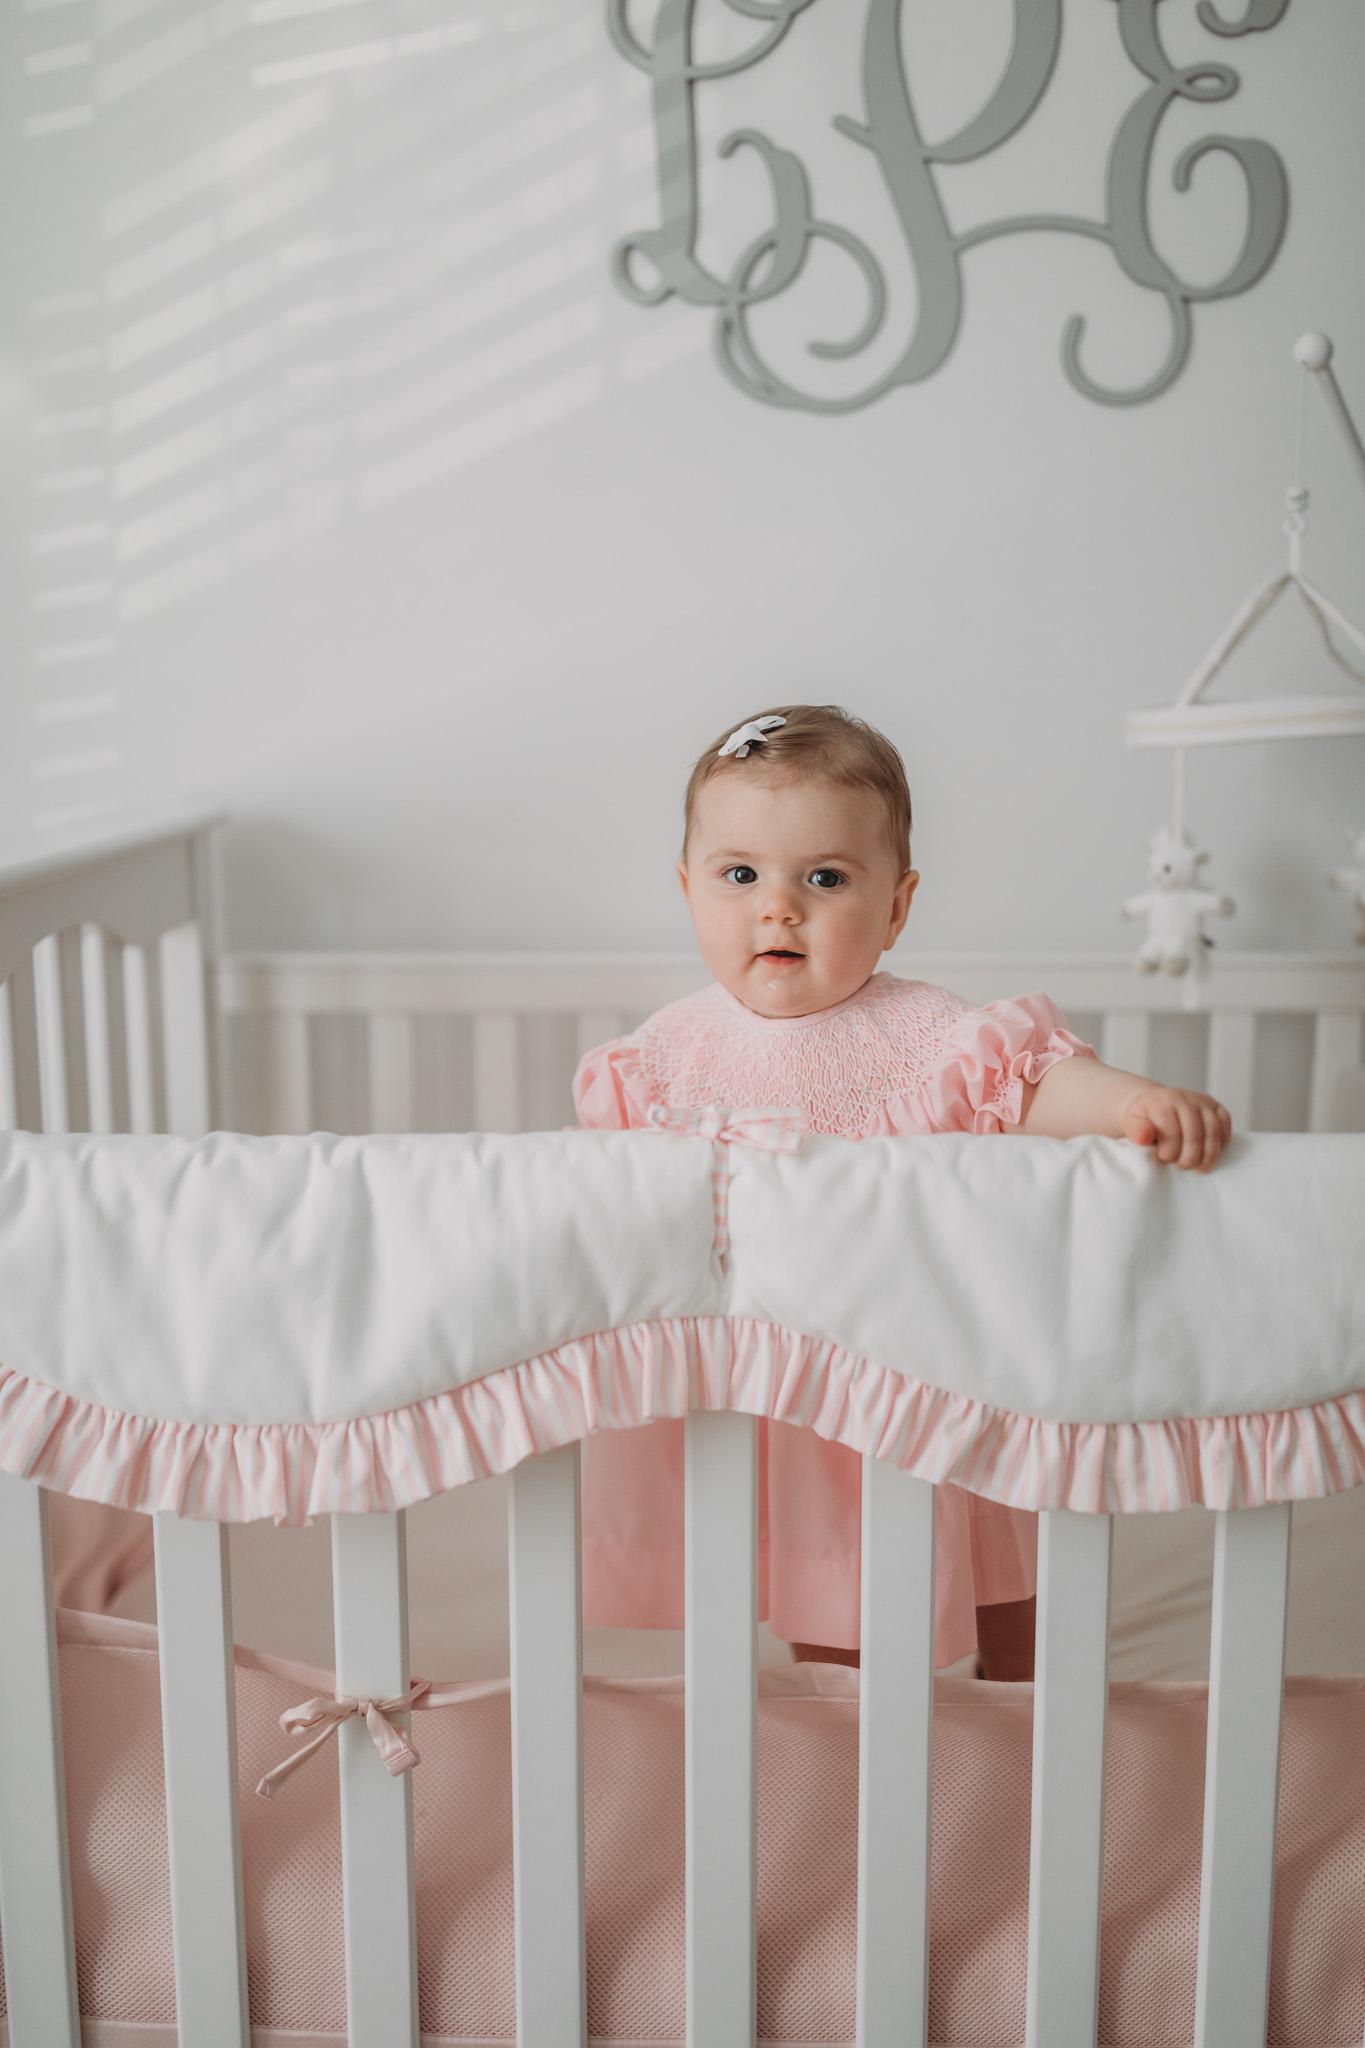 Toddler Standing in Crib